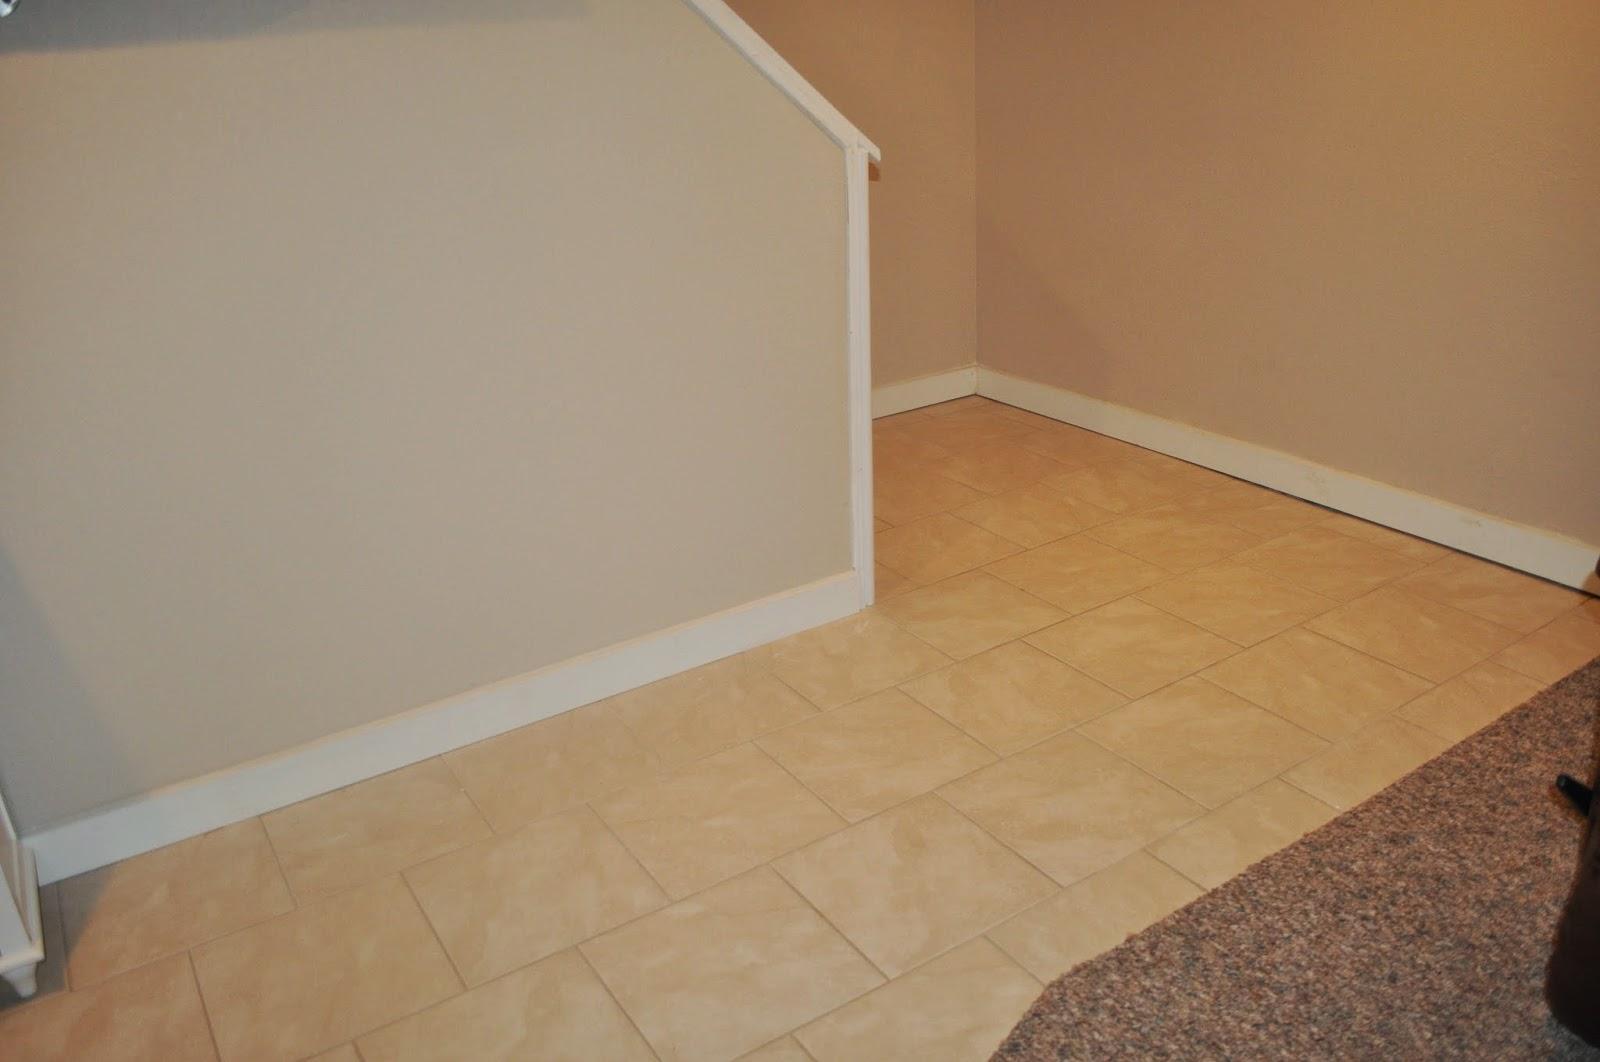 basement, menards, paint, organization, rec room, peel and stick tile, diy, basement project, finished basement